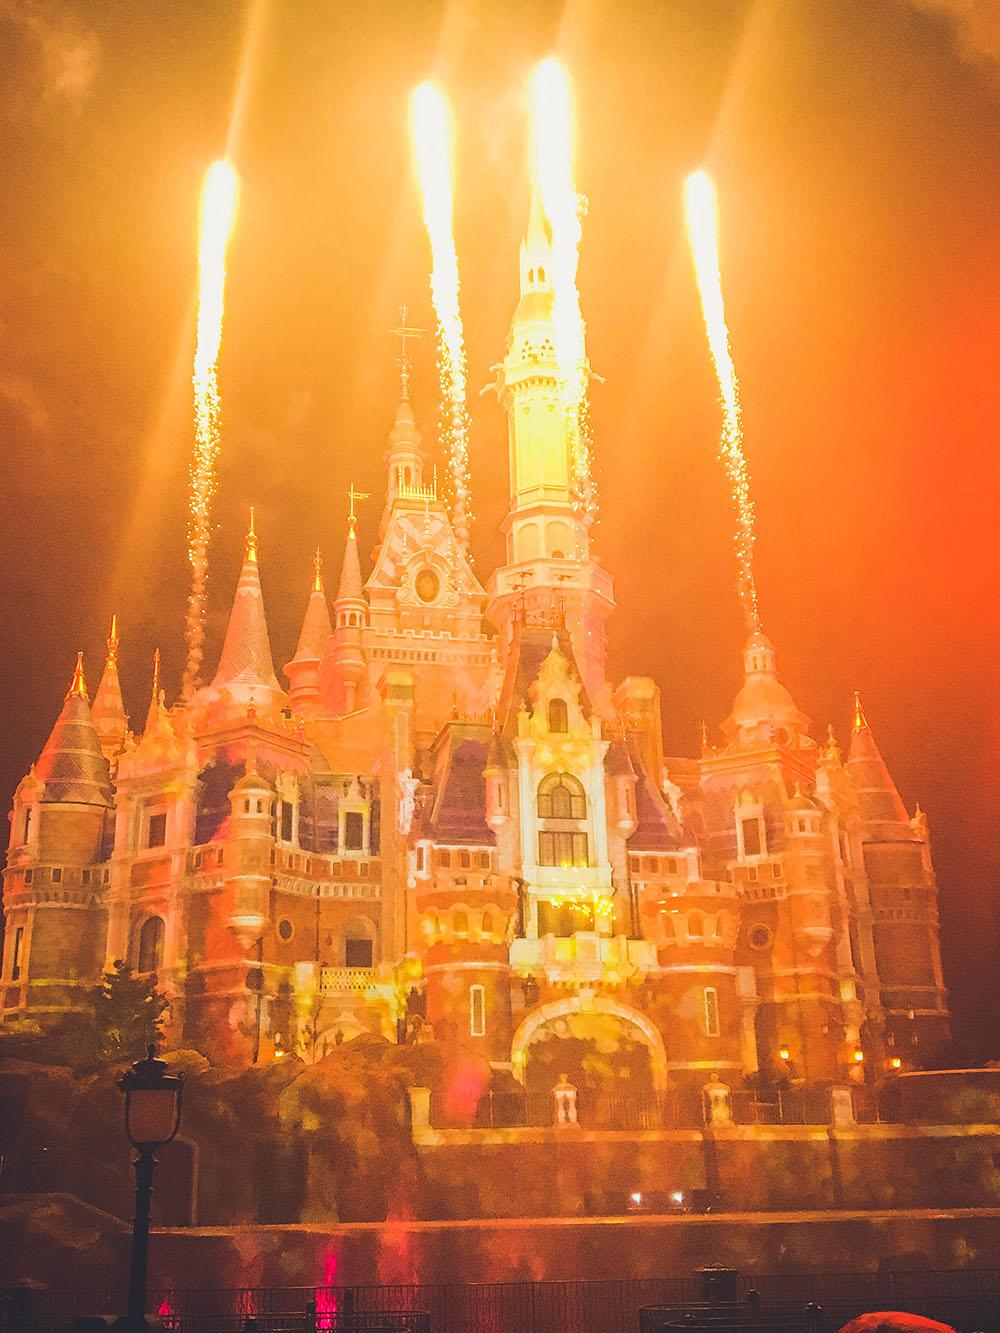 shanghaidisney_castleshow14